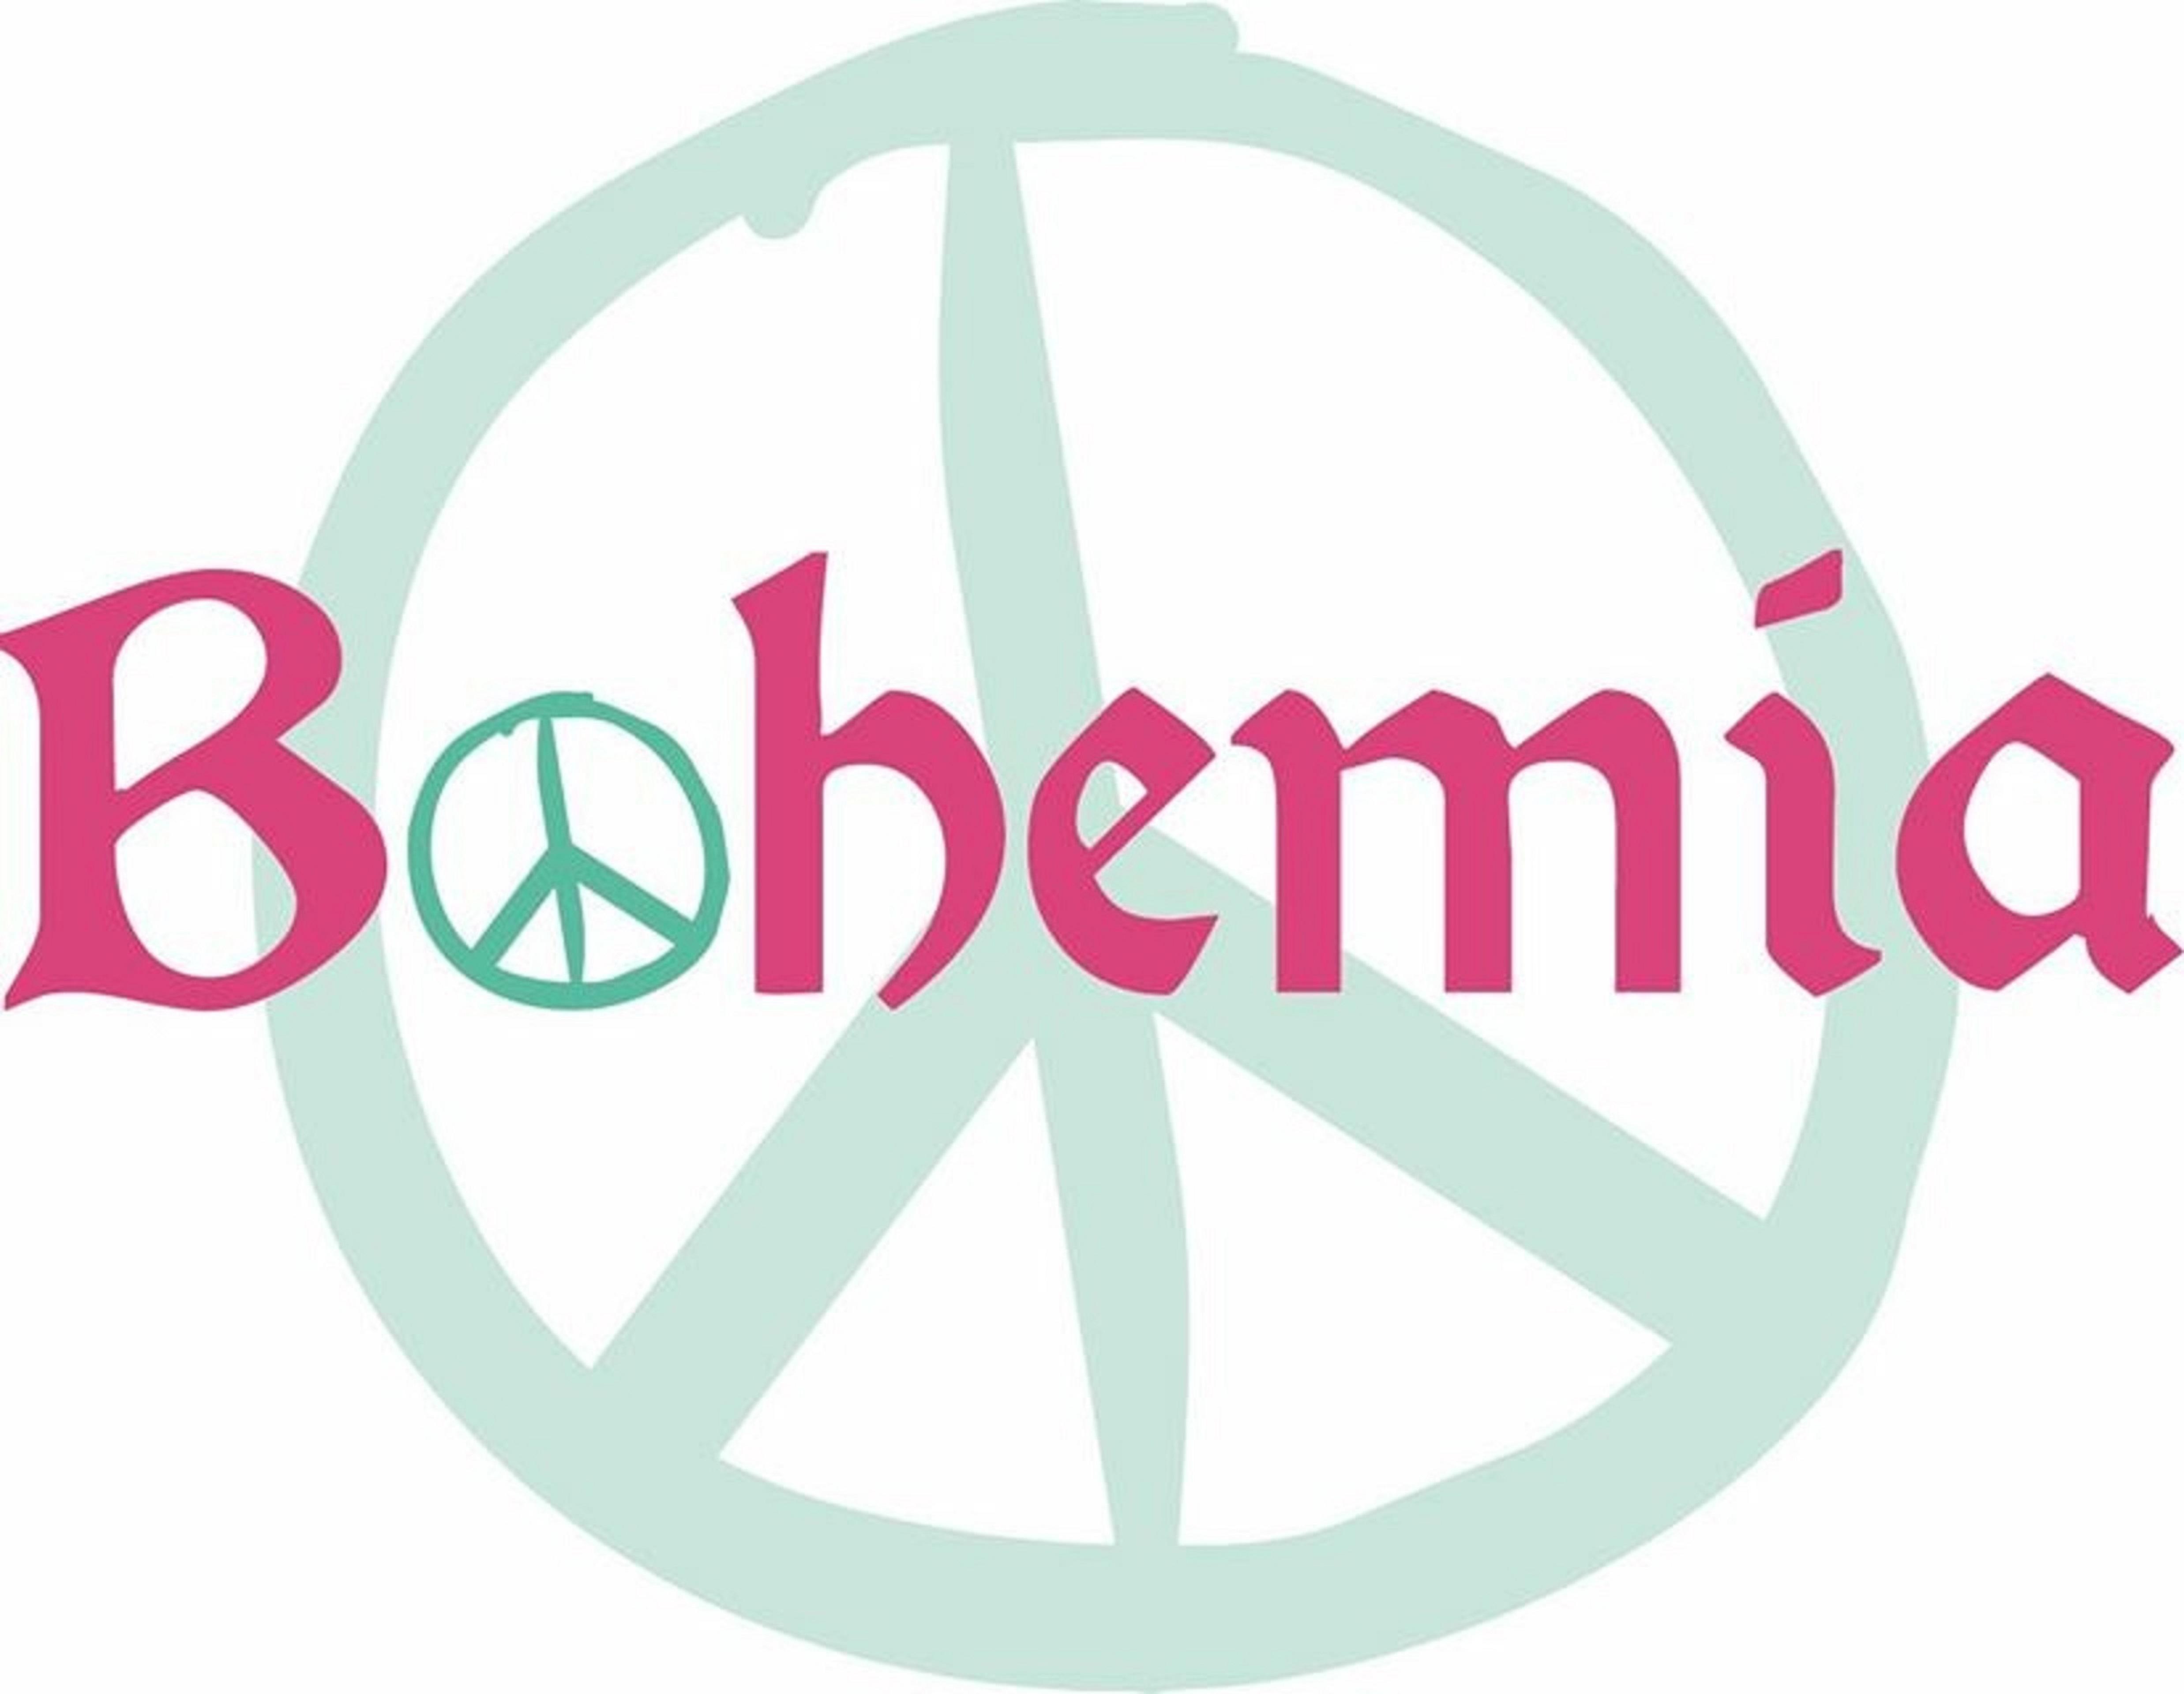 BohemiaStore